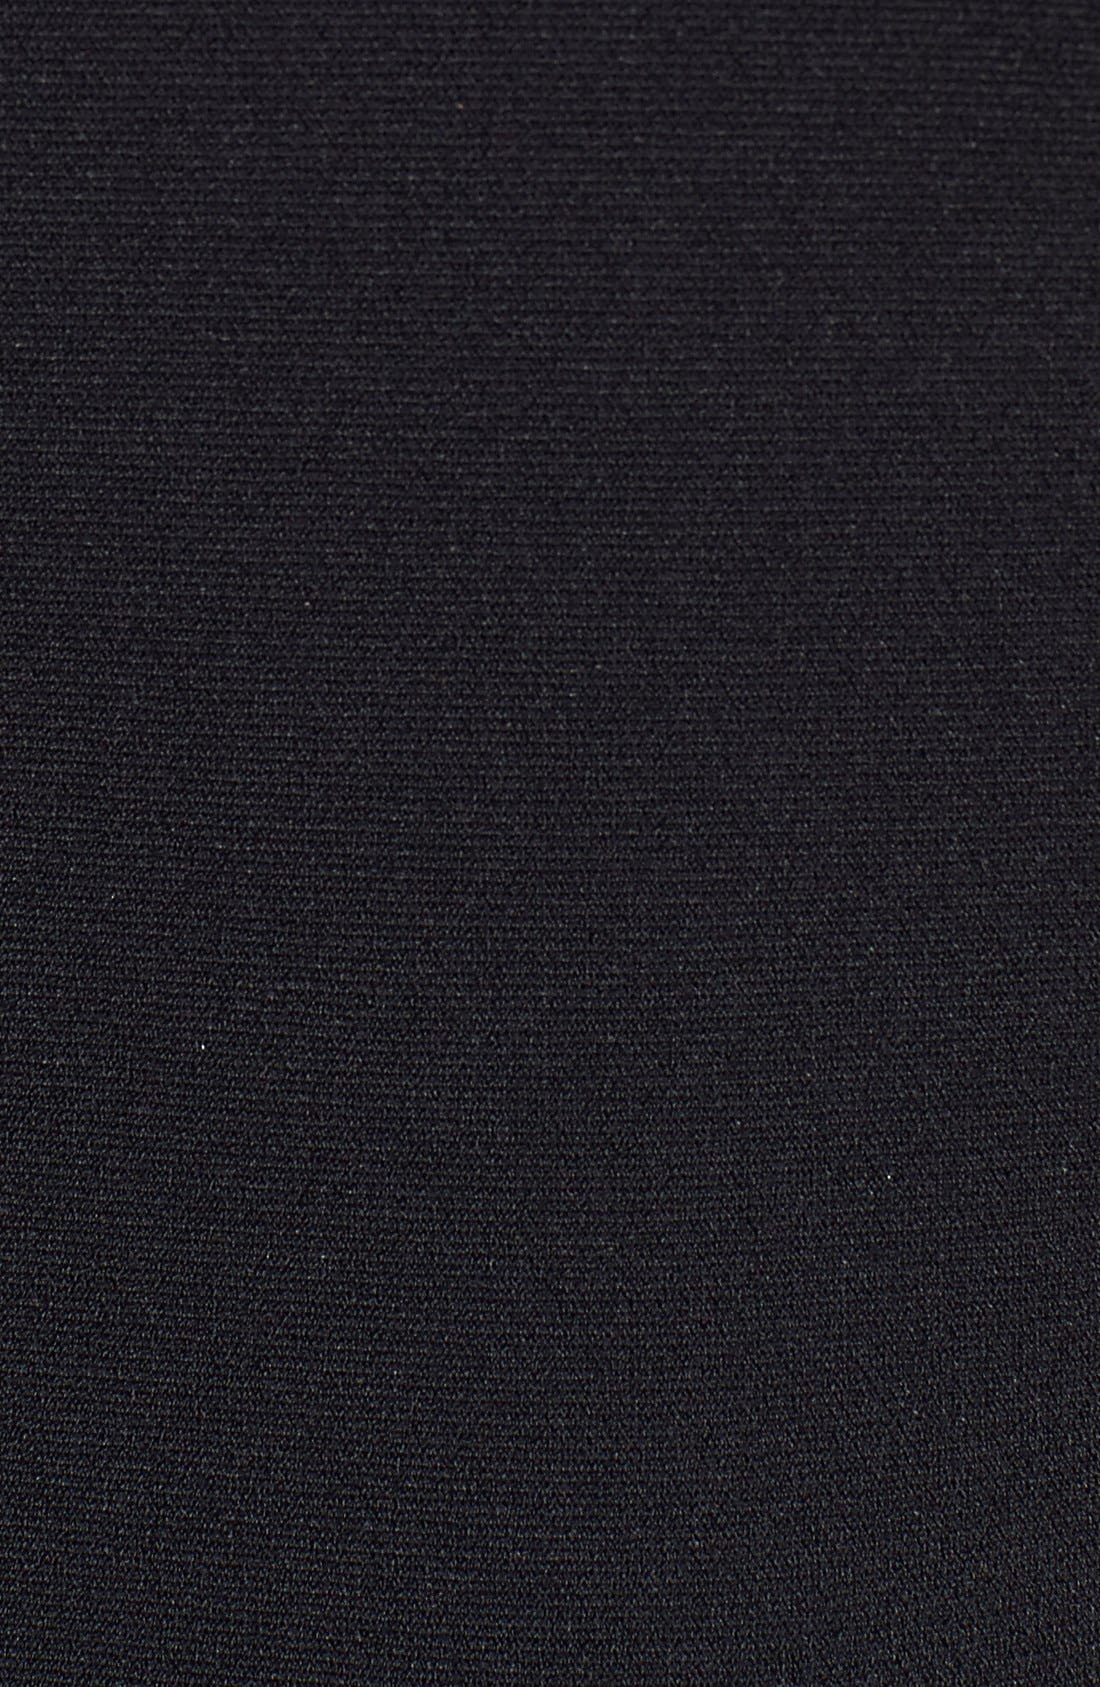 Alternate Image 3  - Alexander McQueen Jacquard Knit Dress